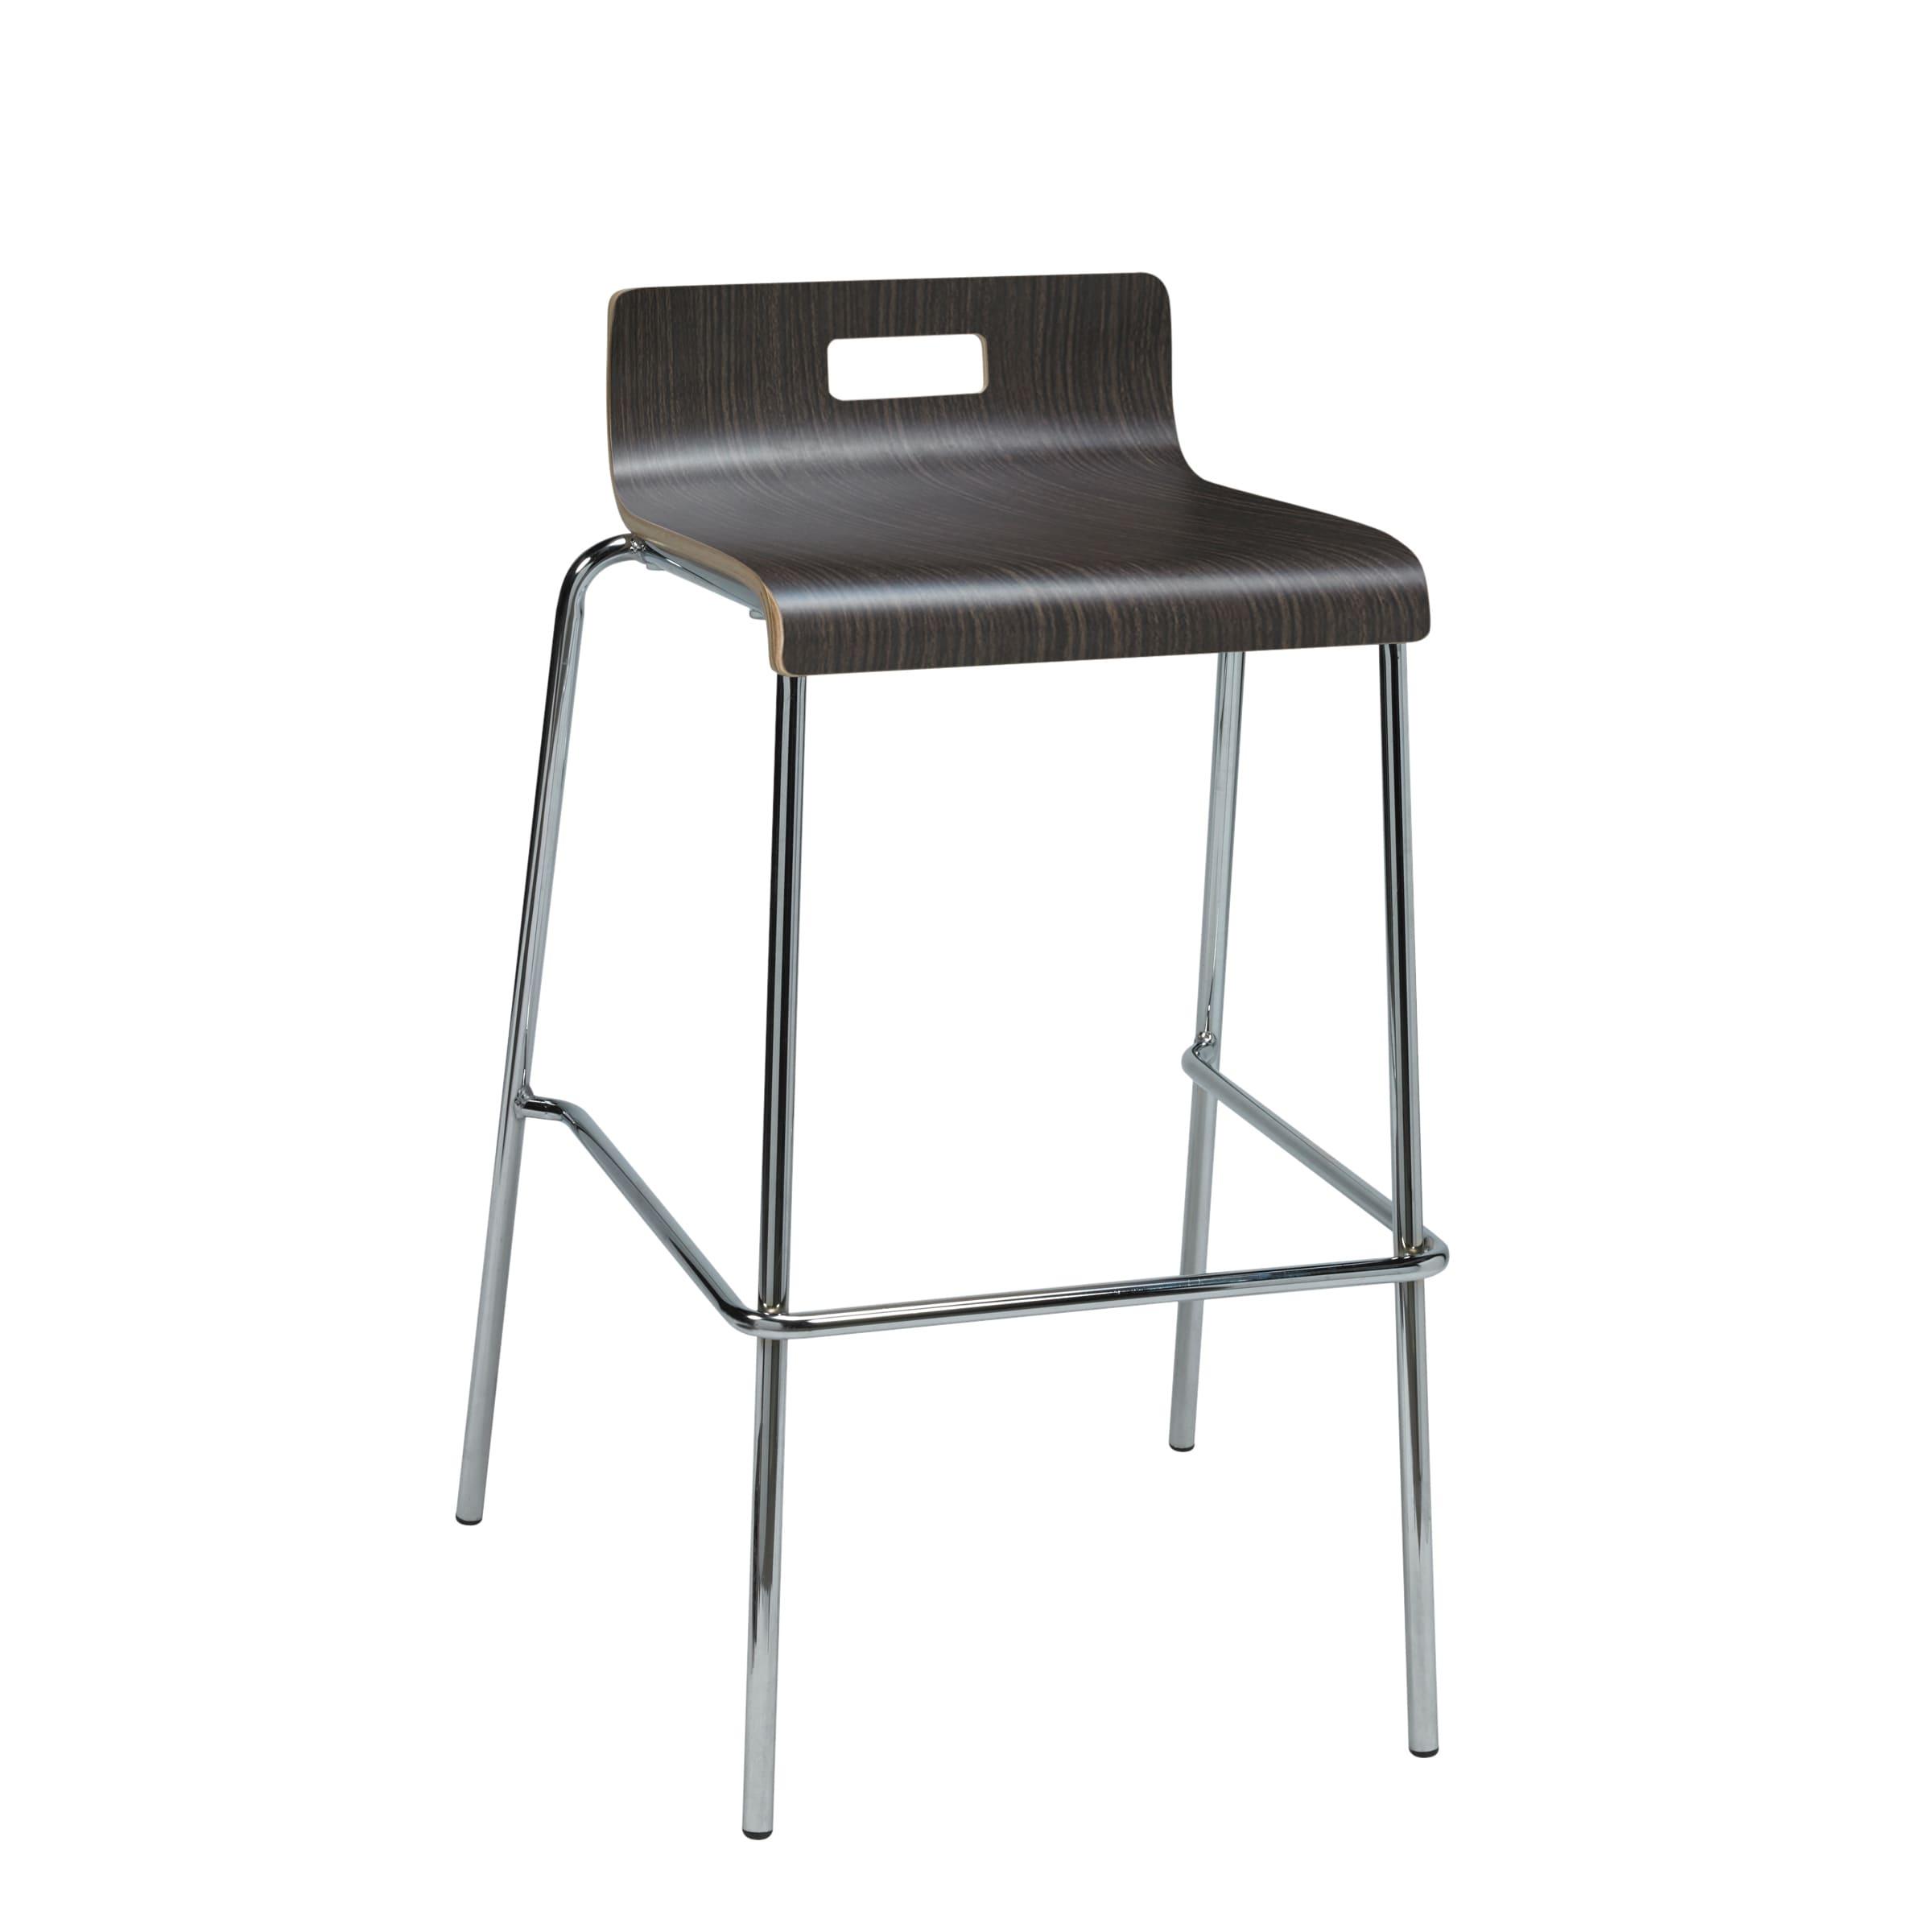 KFI seating Jive Espresso Low-back Barstool (Espresso), B...